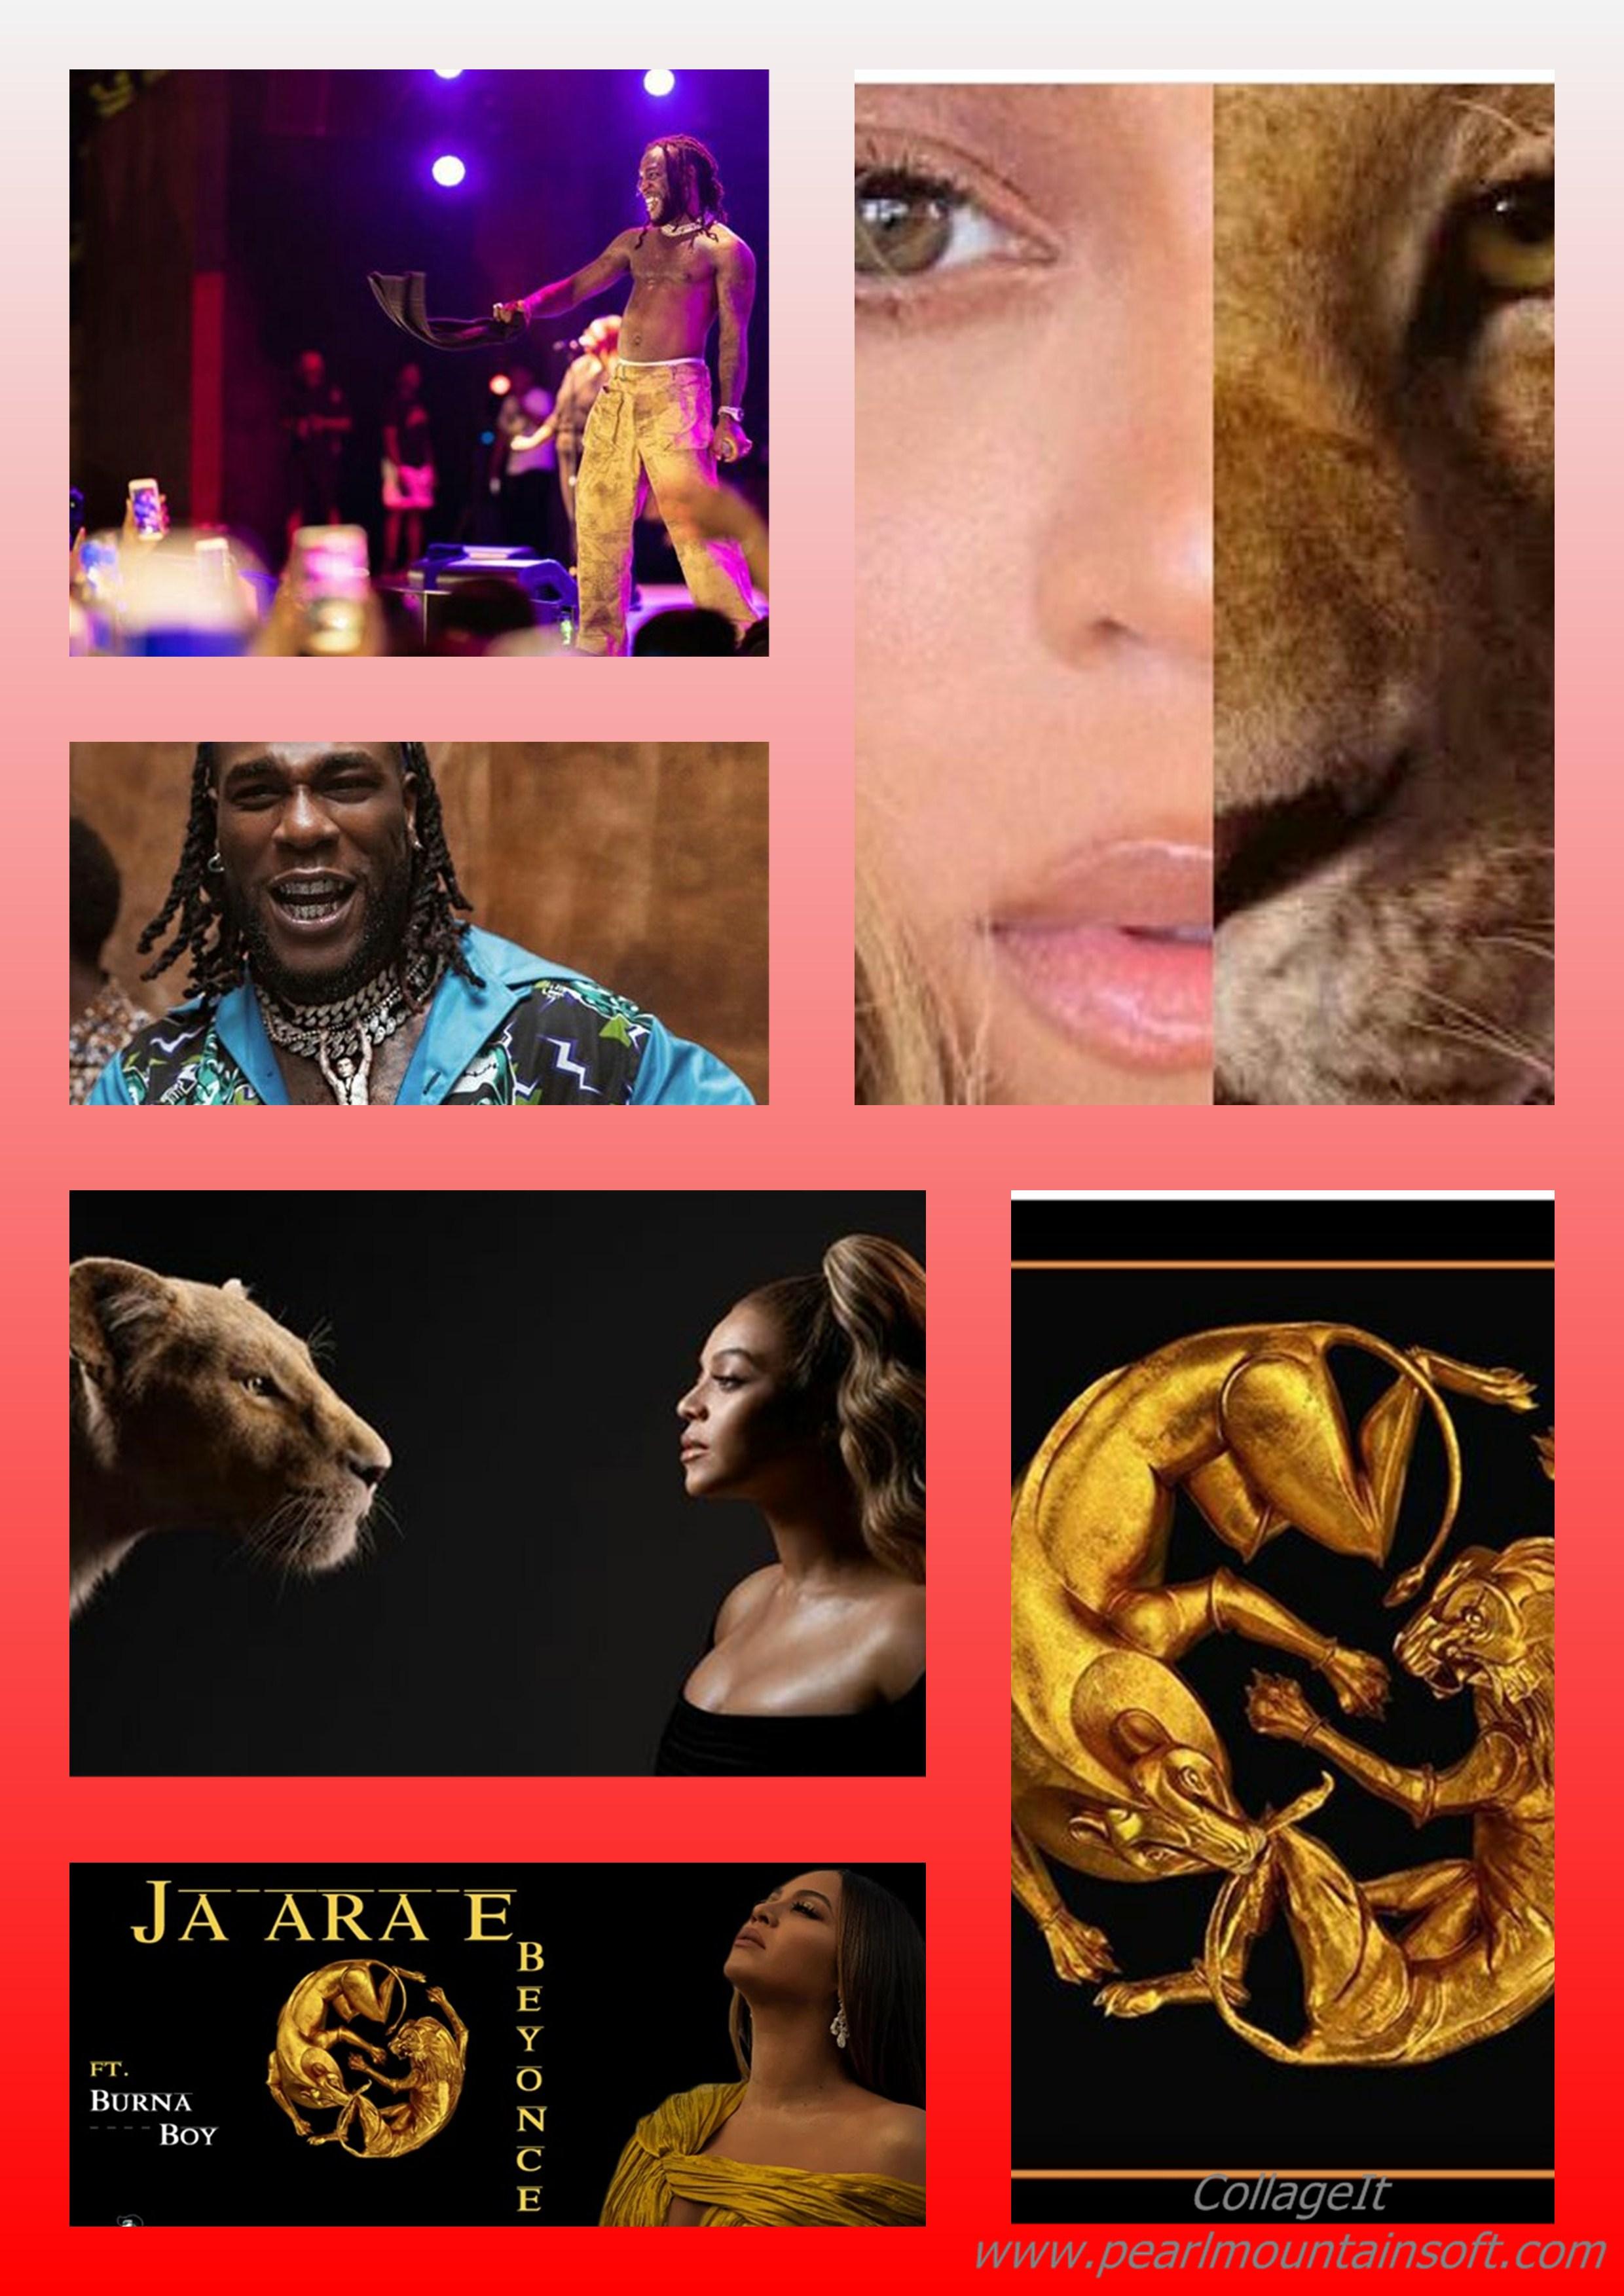 "(LYRICS+TRANSLATION+MEANING) MUSIC REVIEW: JA ARA E BY BEYONCE FT BURNA BOY ""YOU HAVE TO JA ARA E"""